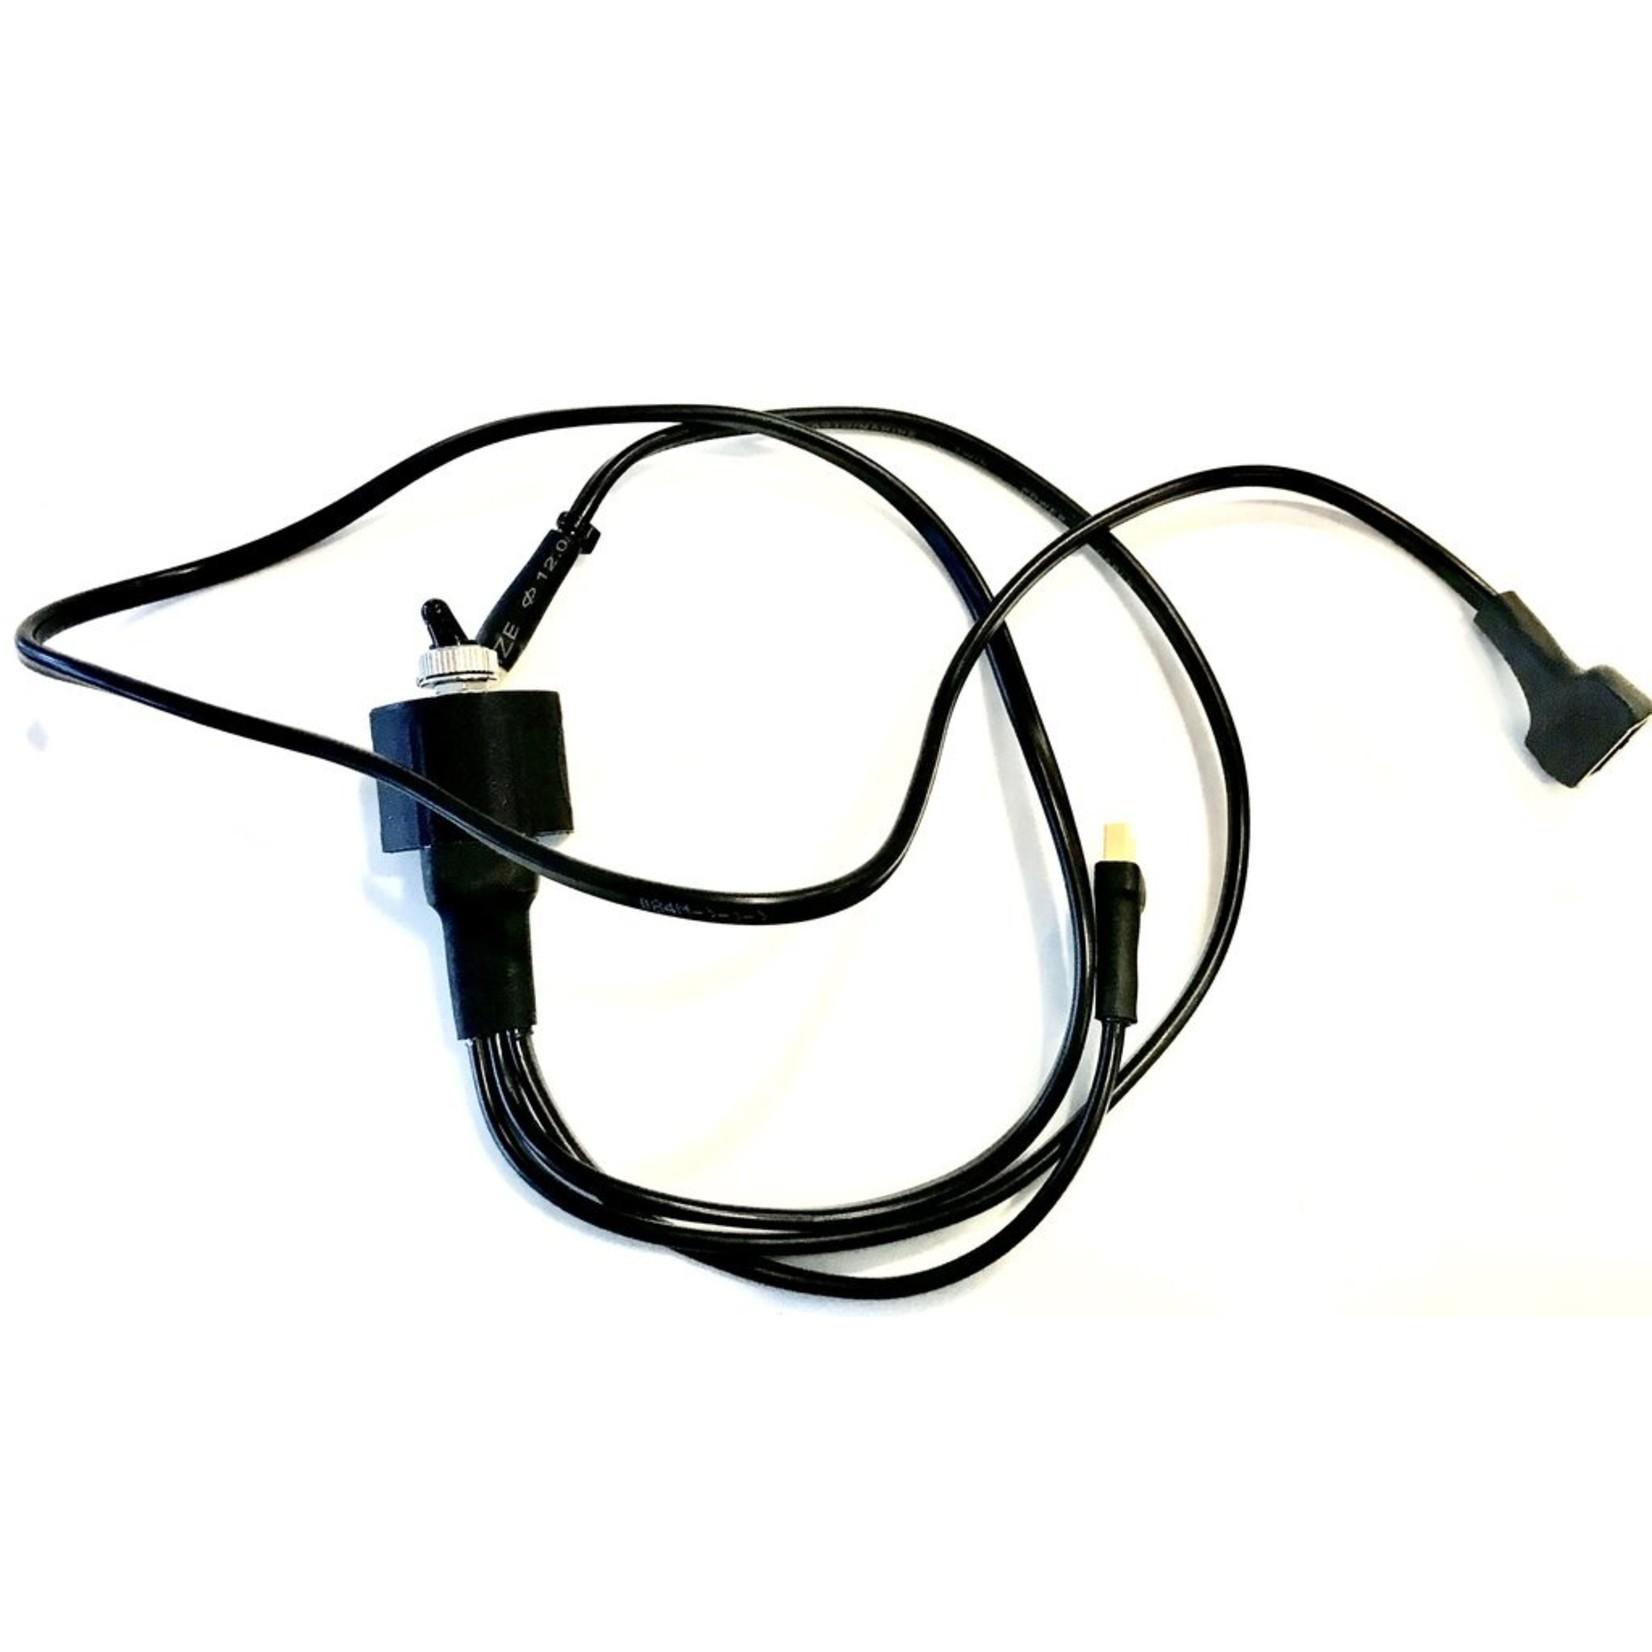 KLite KLite, Bar Switch/Wire Loom